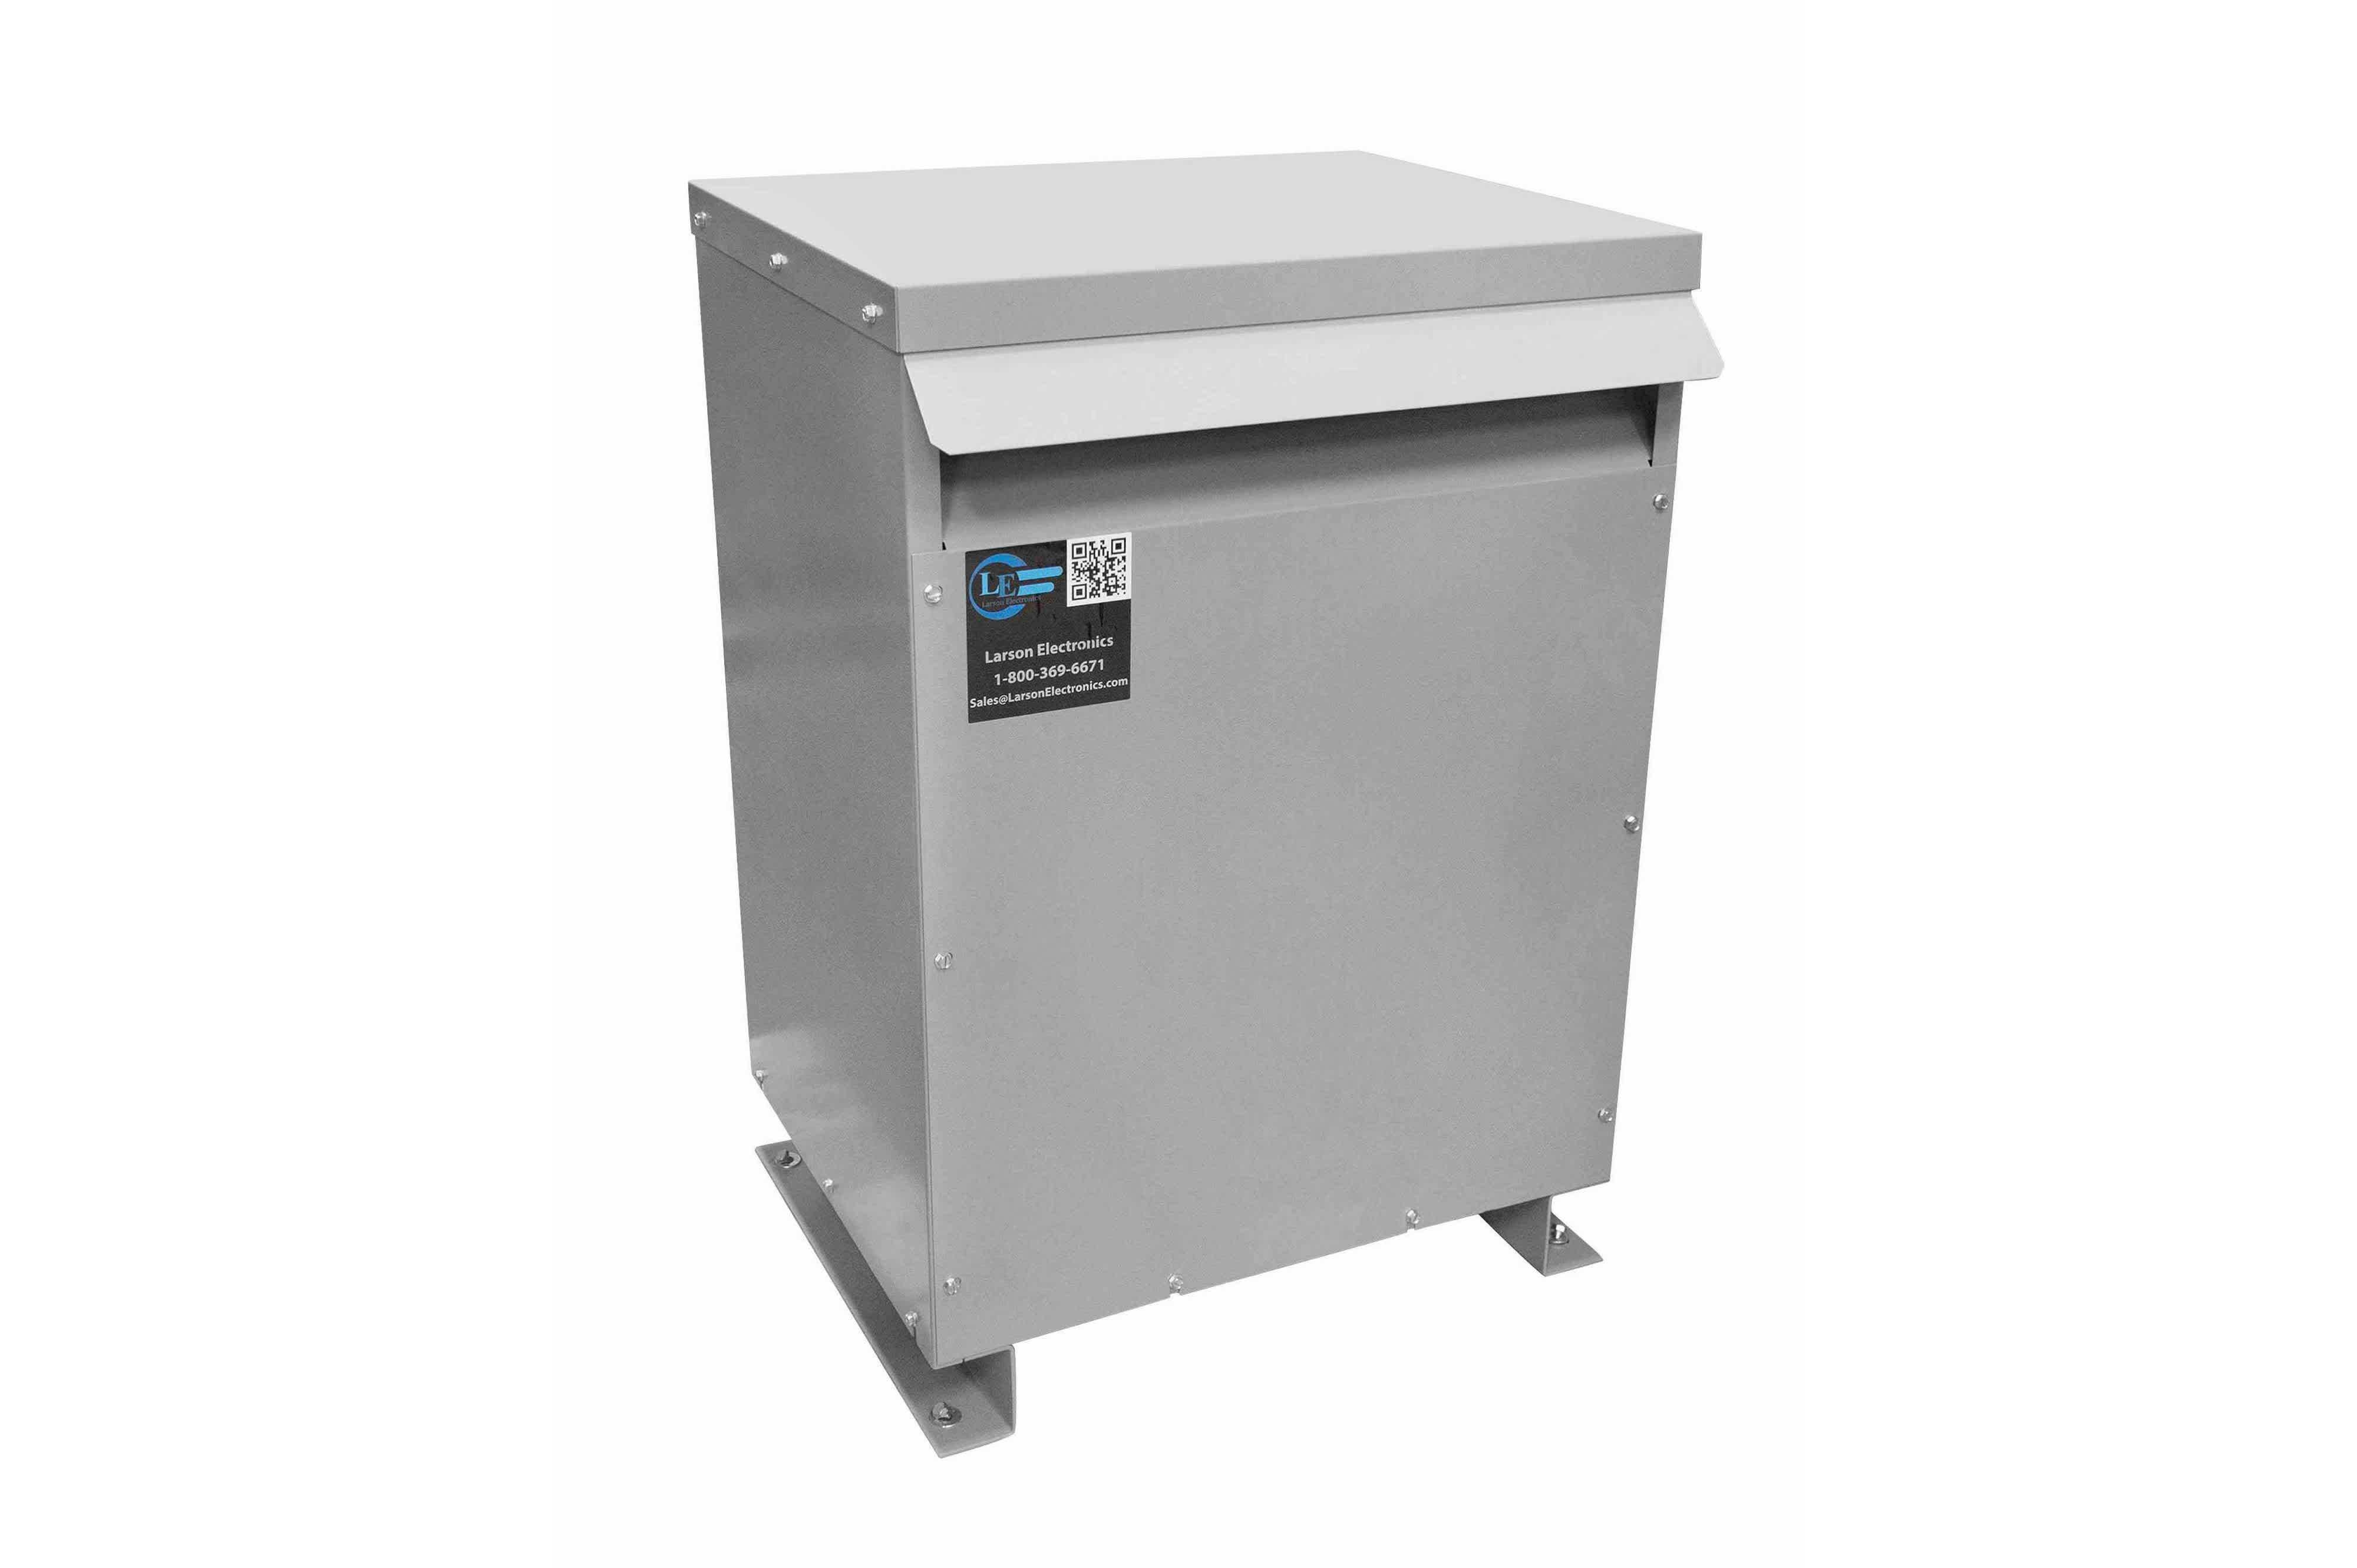 42.5 kVA 3PH Isolation Transformer, 480V Wye Primary, 240V/120 Delta Secondary, N3R, Ventilated, 60 Hz